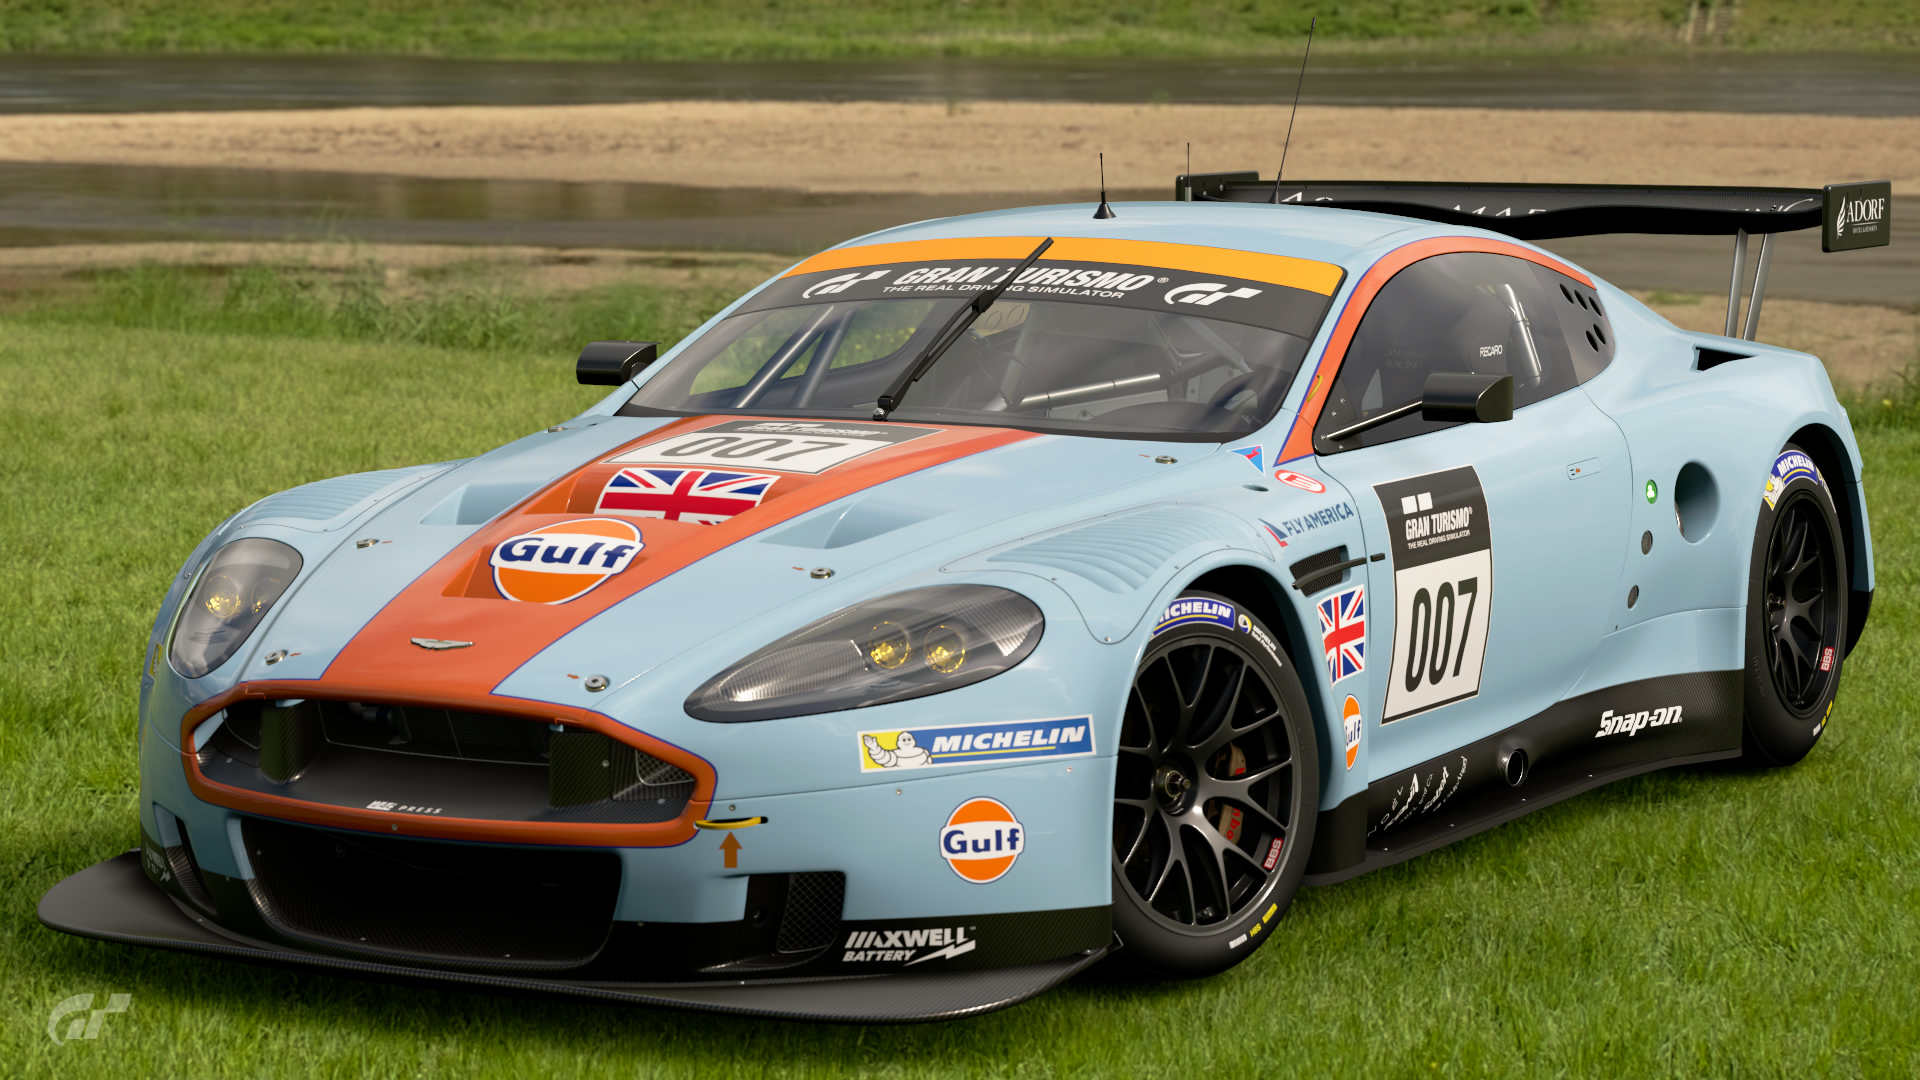 Aston Martin Dbr9 Gt1 10 Gran Turismo Wiki Fandom